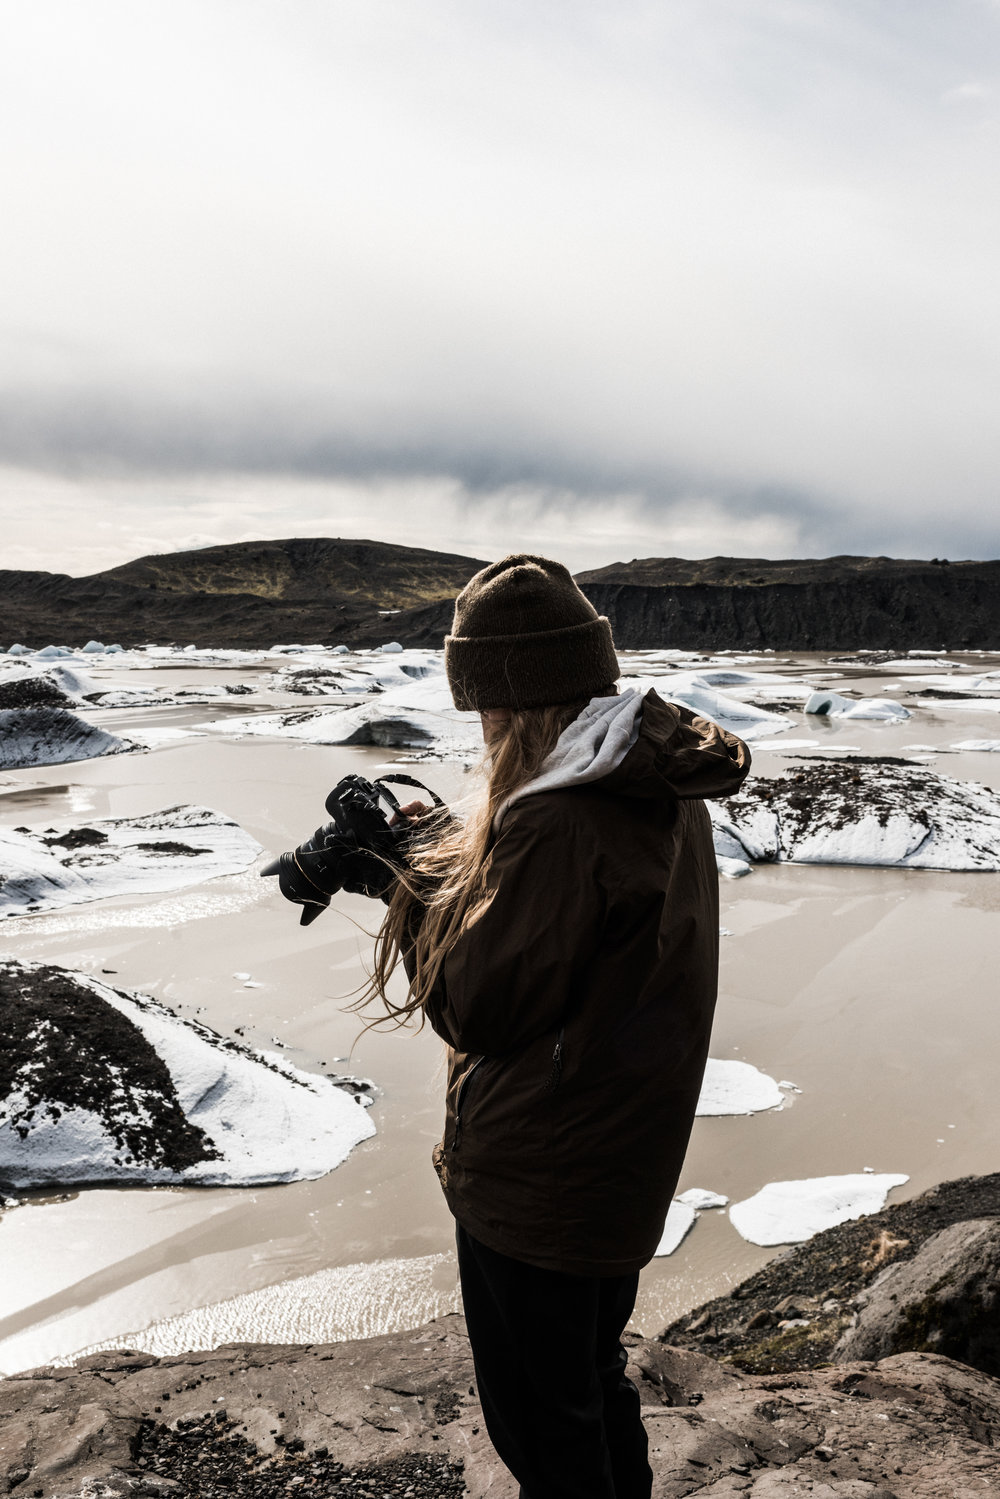 ICELAND_WOMAN_PHOTOGRAPHER_TARASHUPE_OUTDOOR_PHOTOGRAPHY_111.jpg